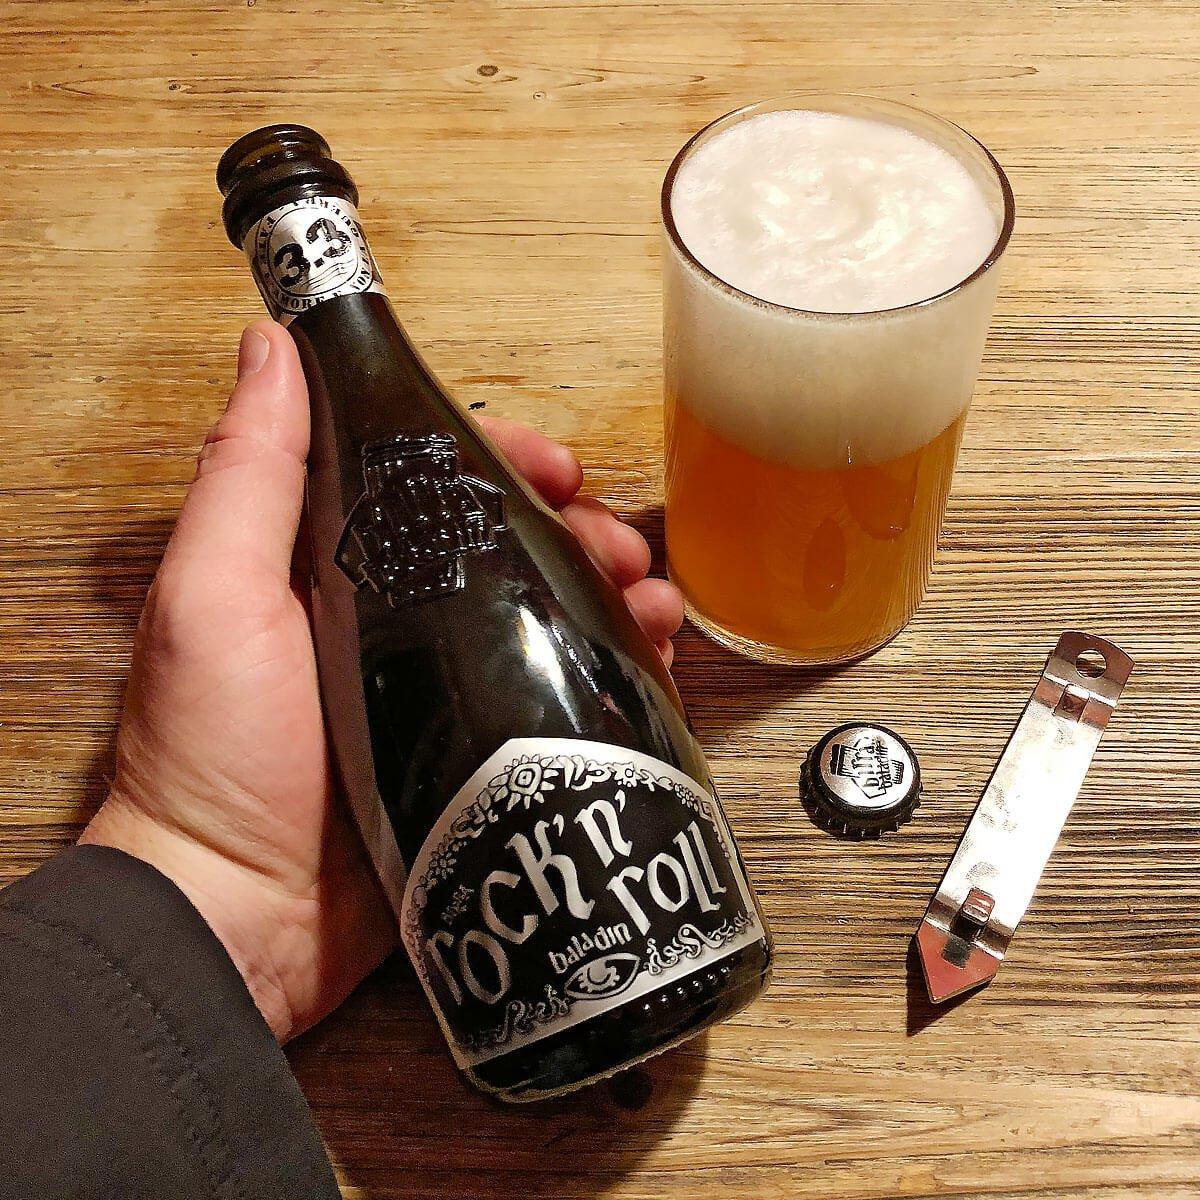 Rock 'N' Roll, an American-style Pale Ale by Birrificio Le Baladin